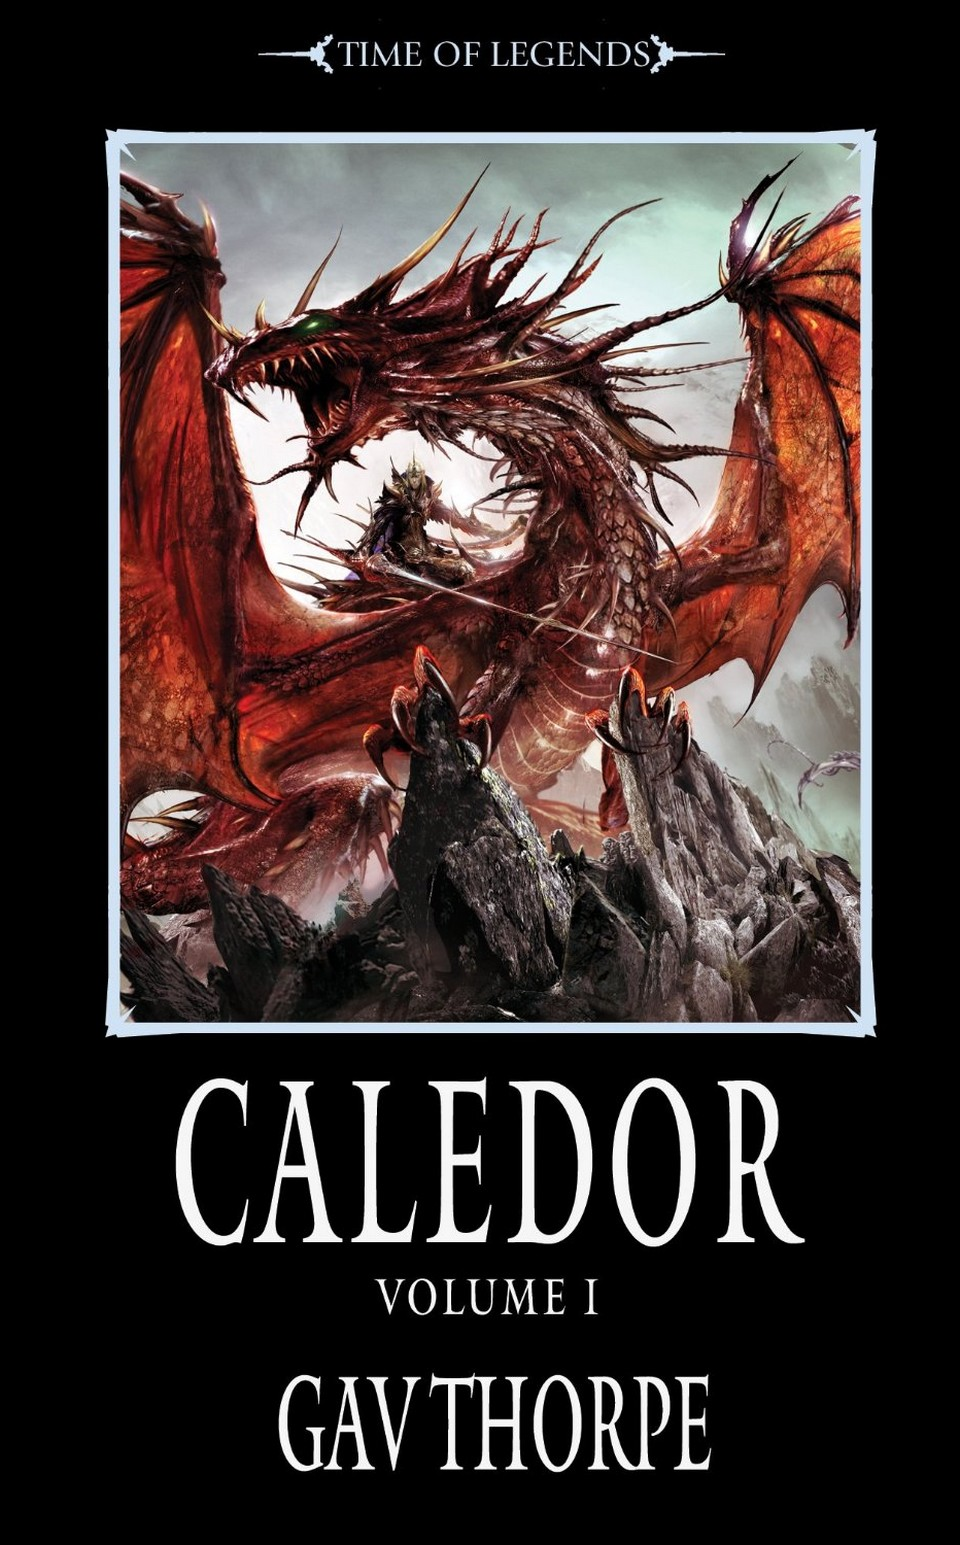 Caledor Volume 1 et 2 de Gav Thorpe 512337Caledorvol1